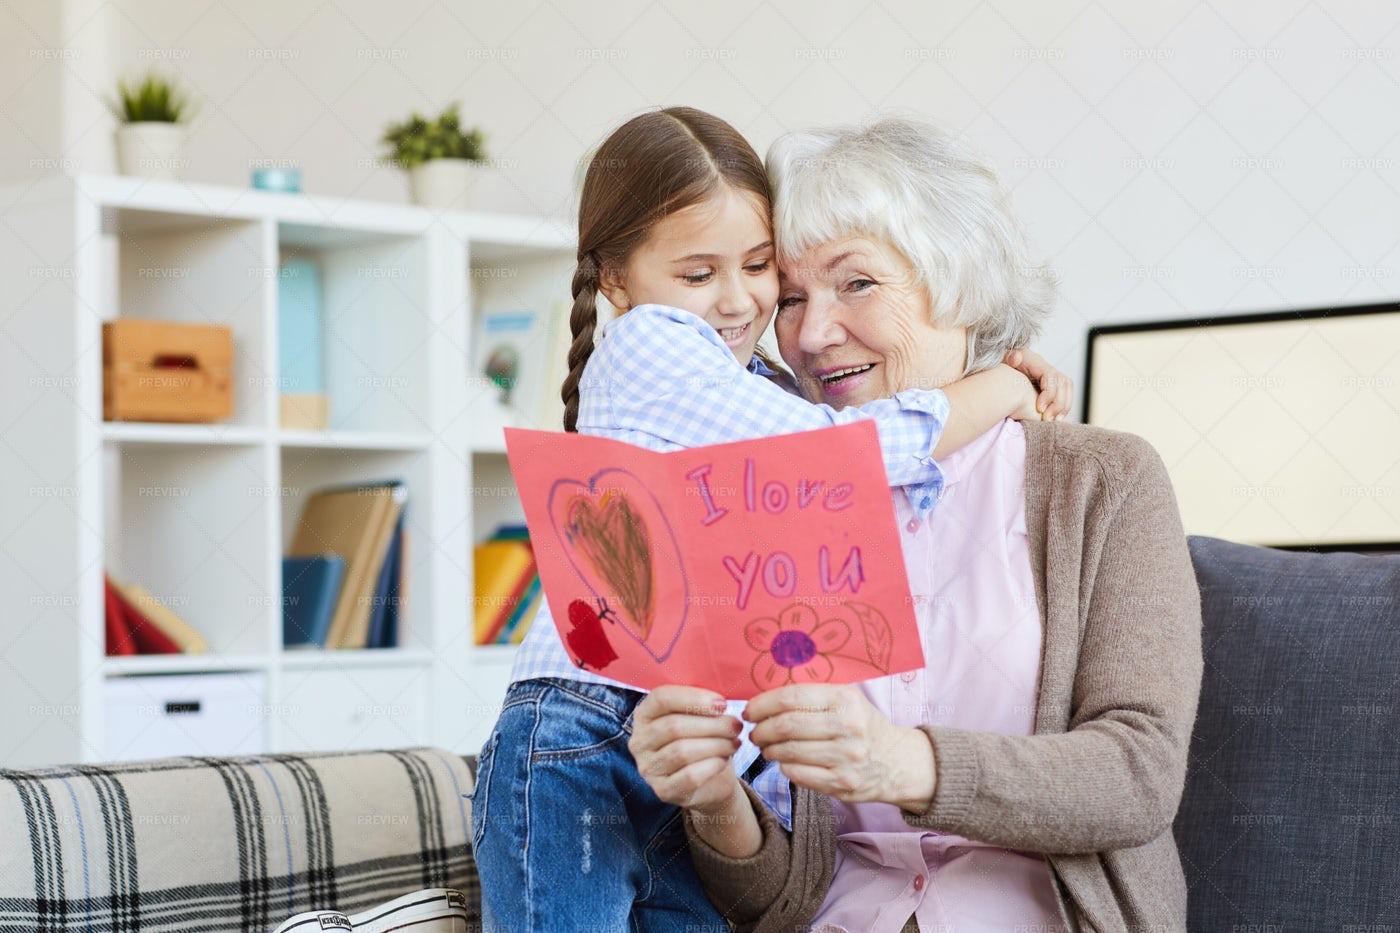 I Love You Card For Grandma: Stock Photos